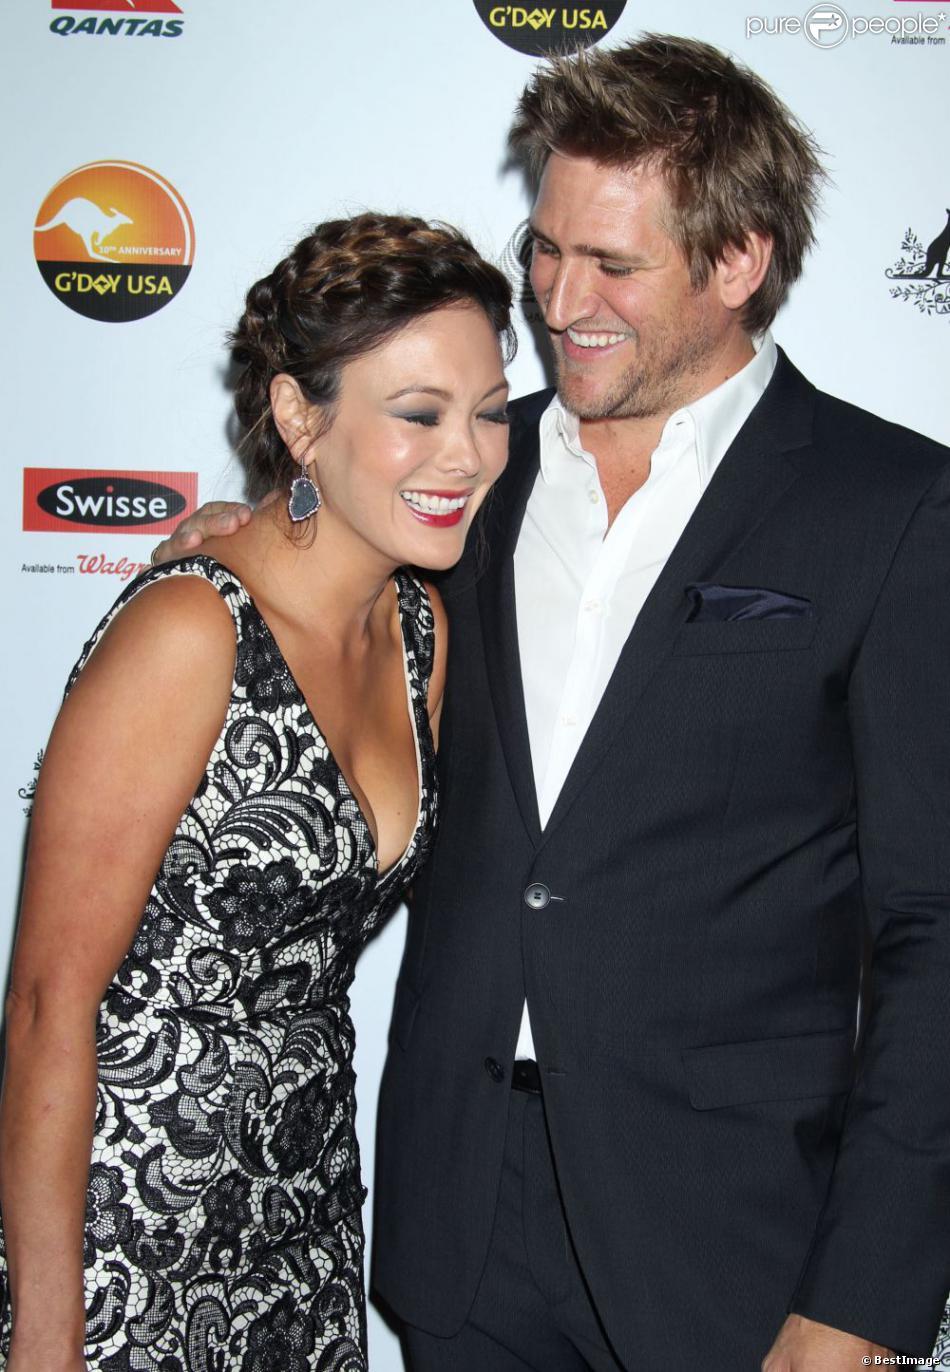 Lindsay Price et son mari Curtis Stone lors du Gala G'Day USA Los Angeles Black Tie 2013, le 12 janvier 2013.